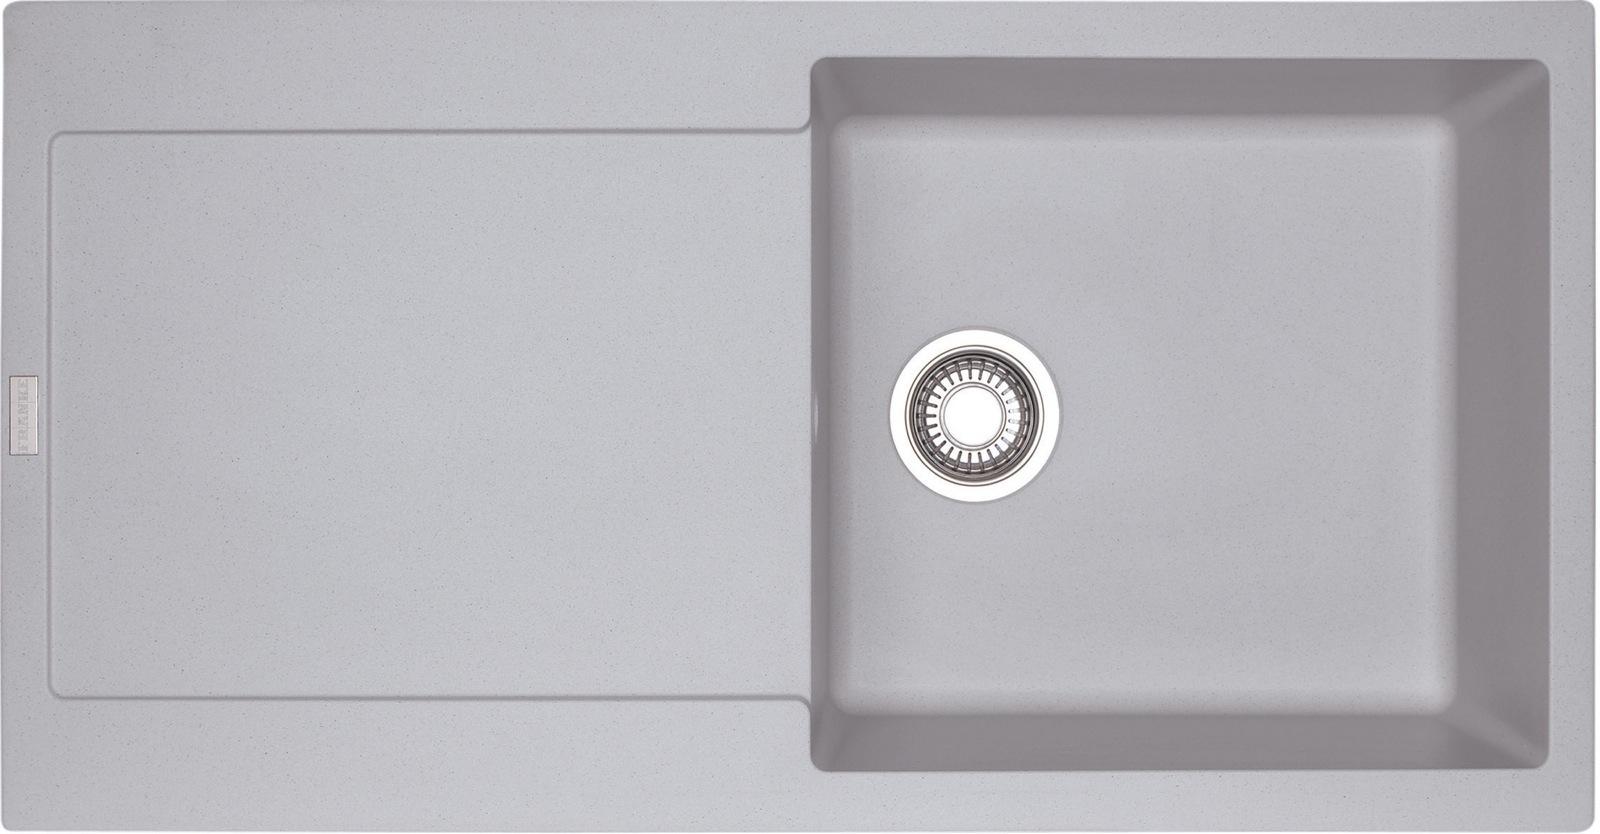 Chiuveta bucatarie fragranite Franke Maris MRG 611-L reversibila 970x500mm tehnologie Sanitized Alluminio imagine sensodays.ro